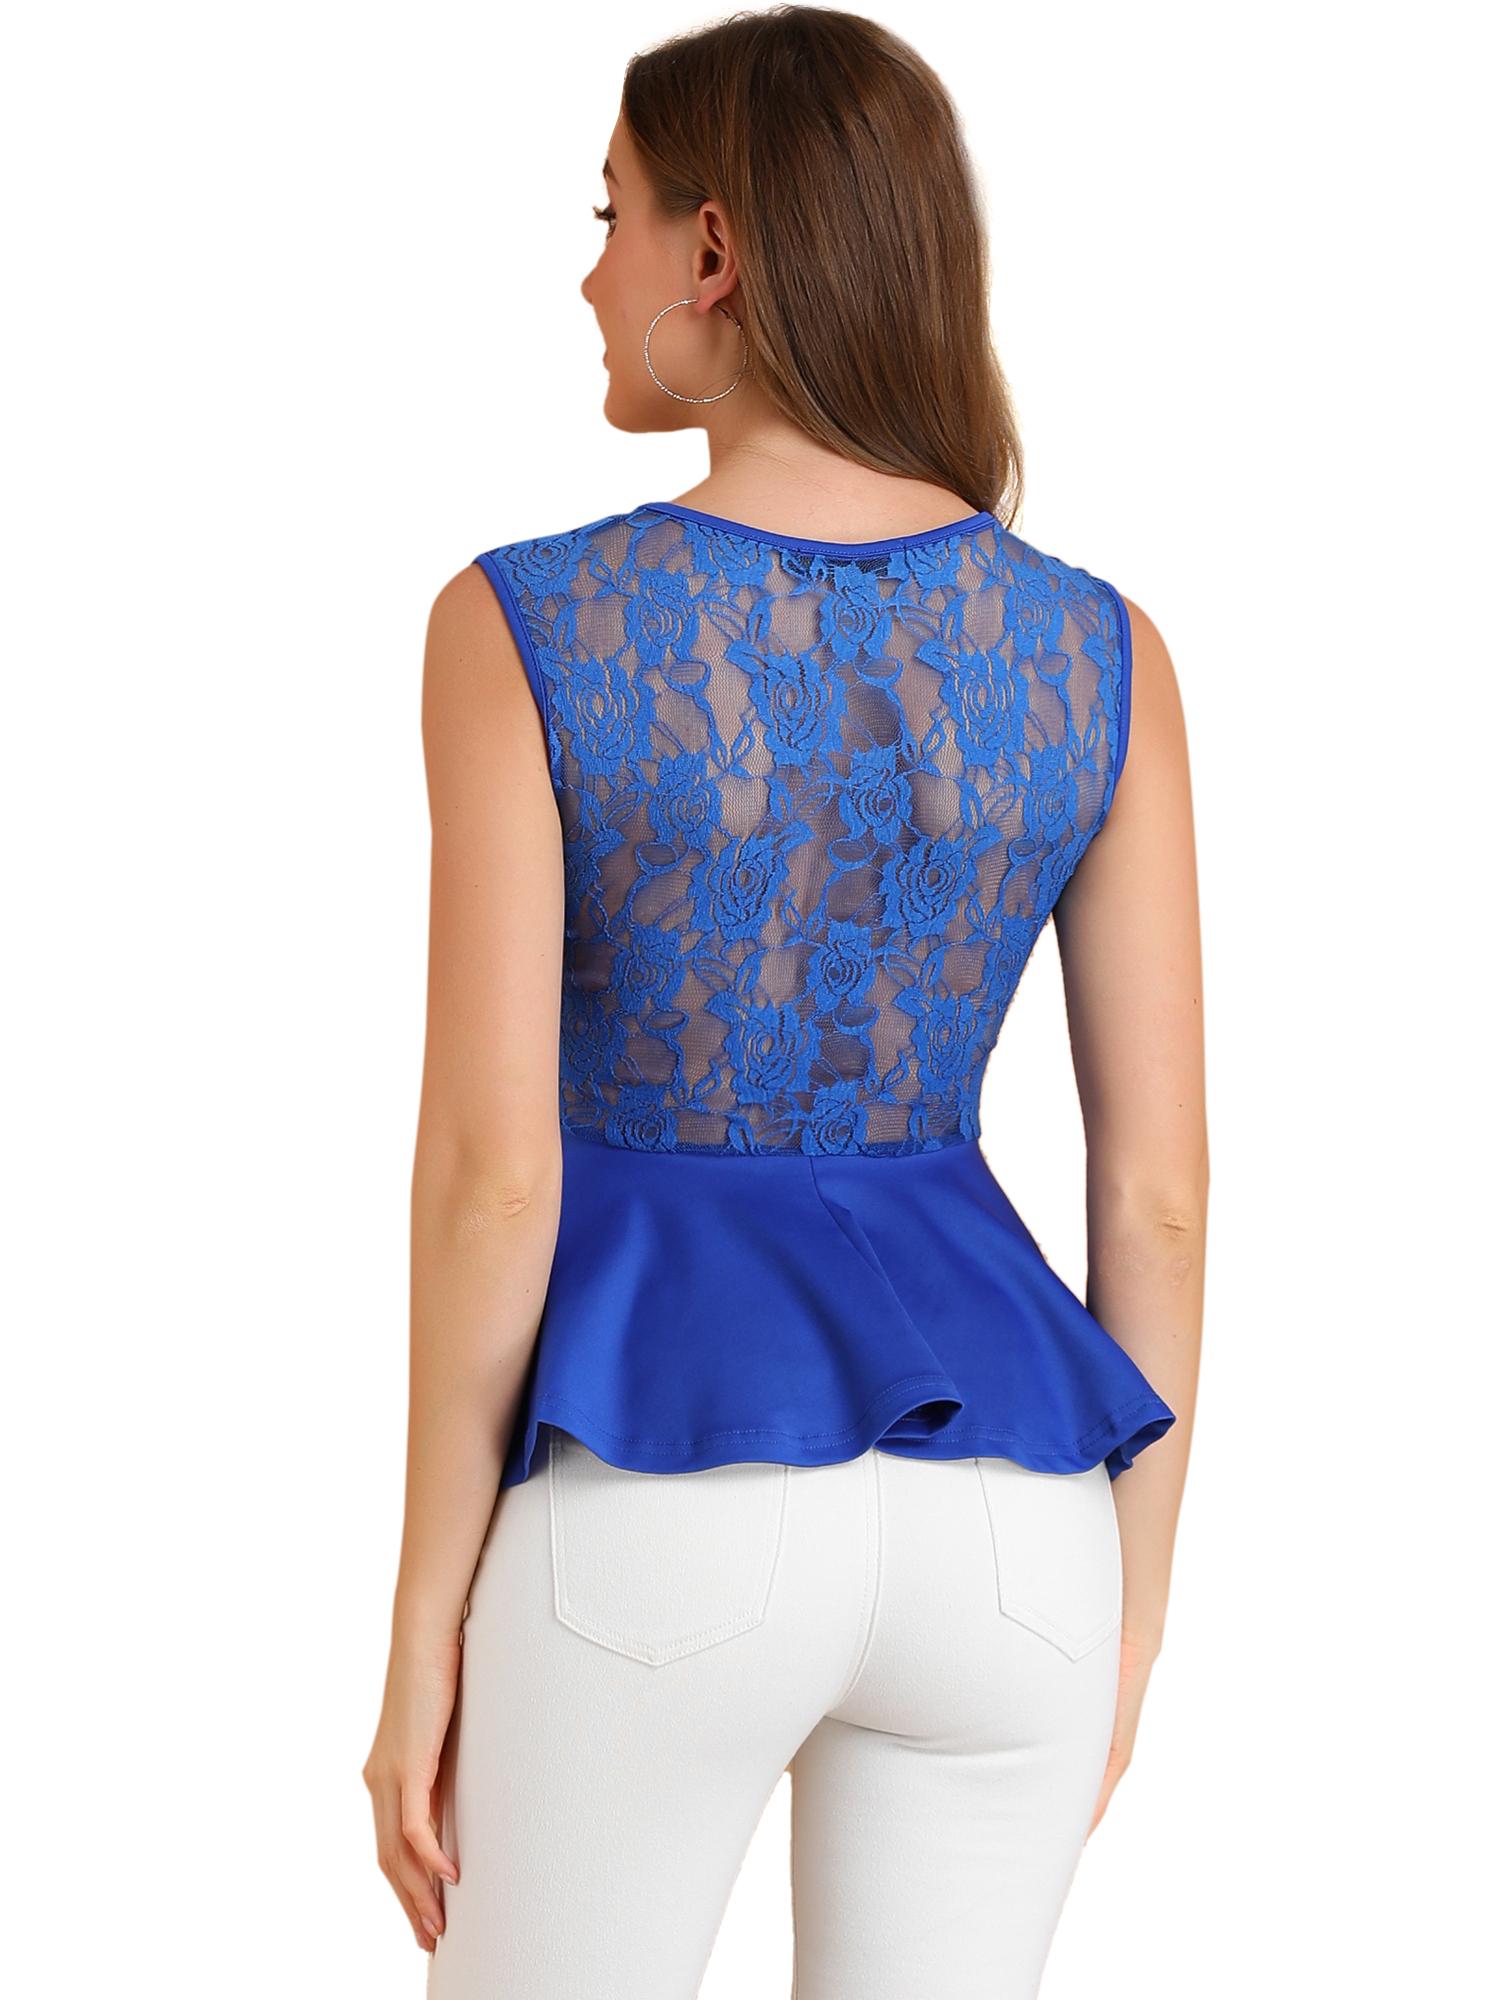 Women Round Neck Lace-Paneled Sleeveless Peplum Top Blue S